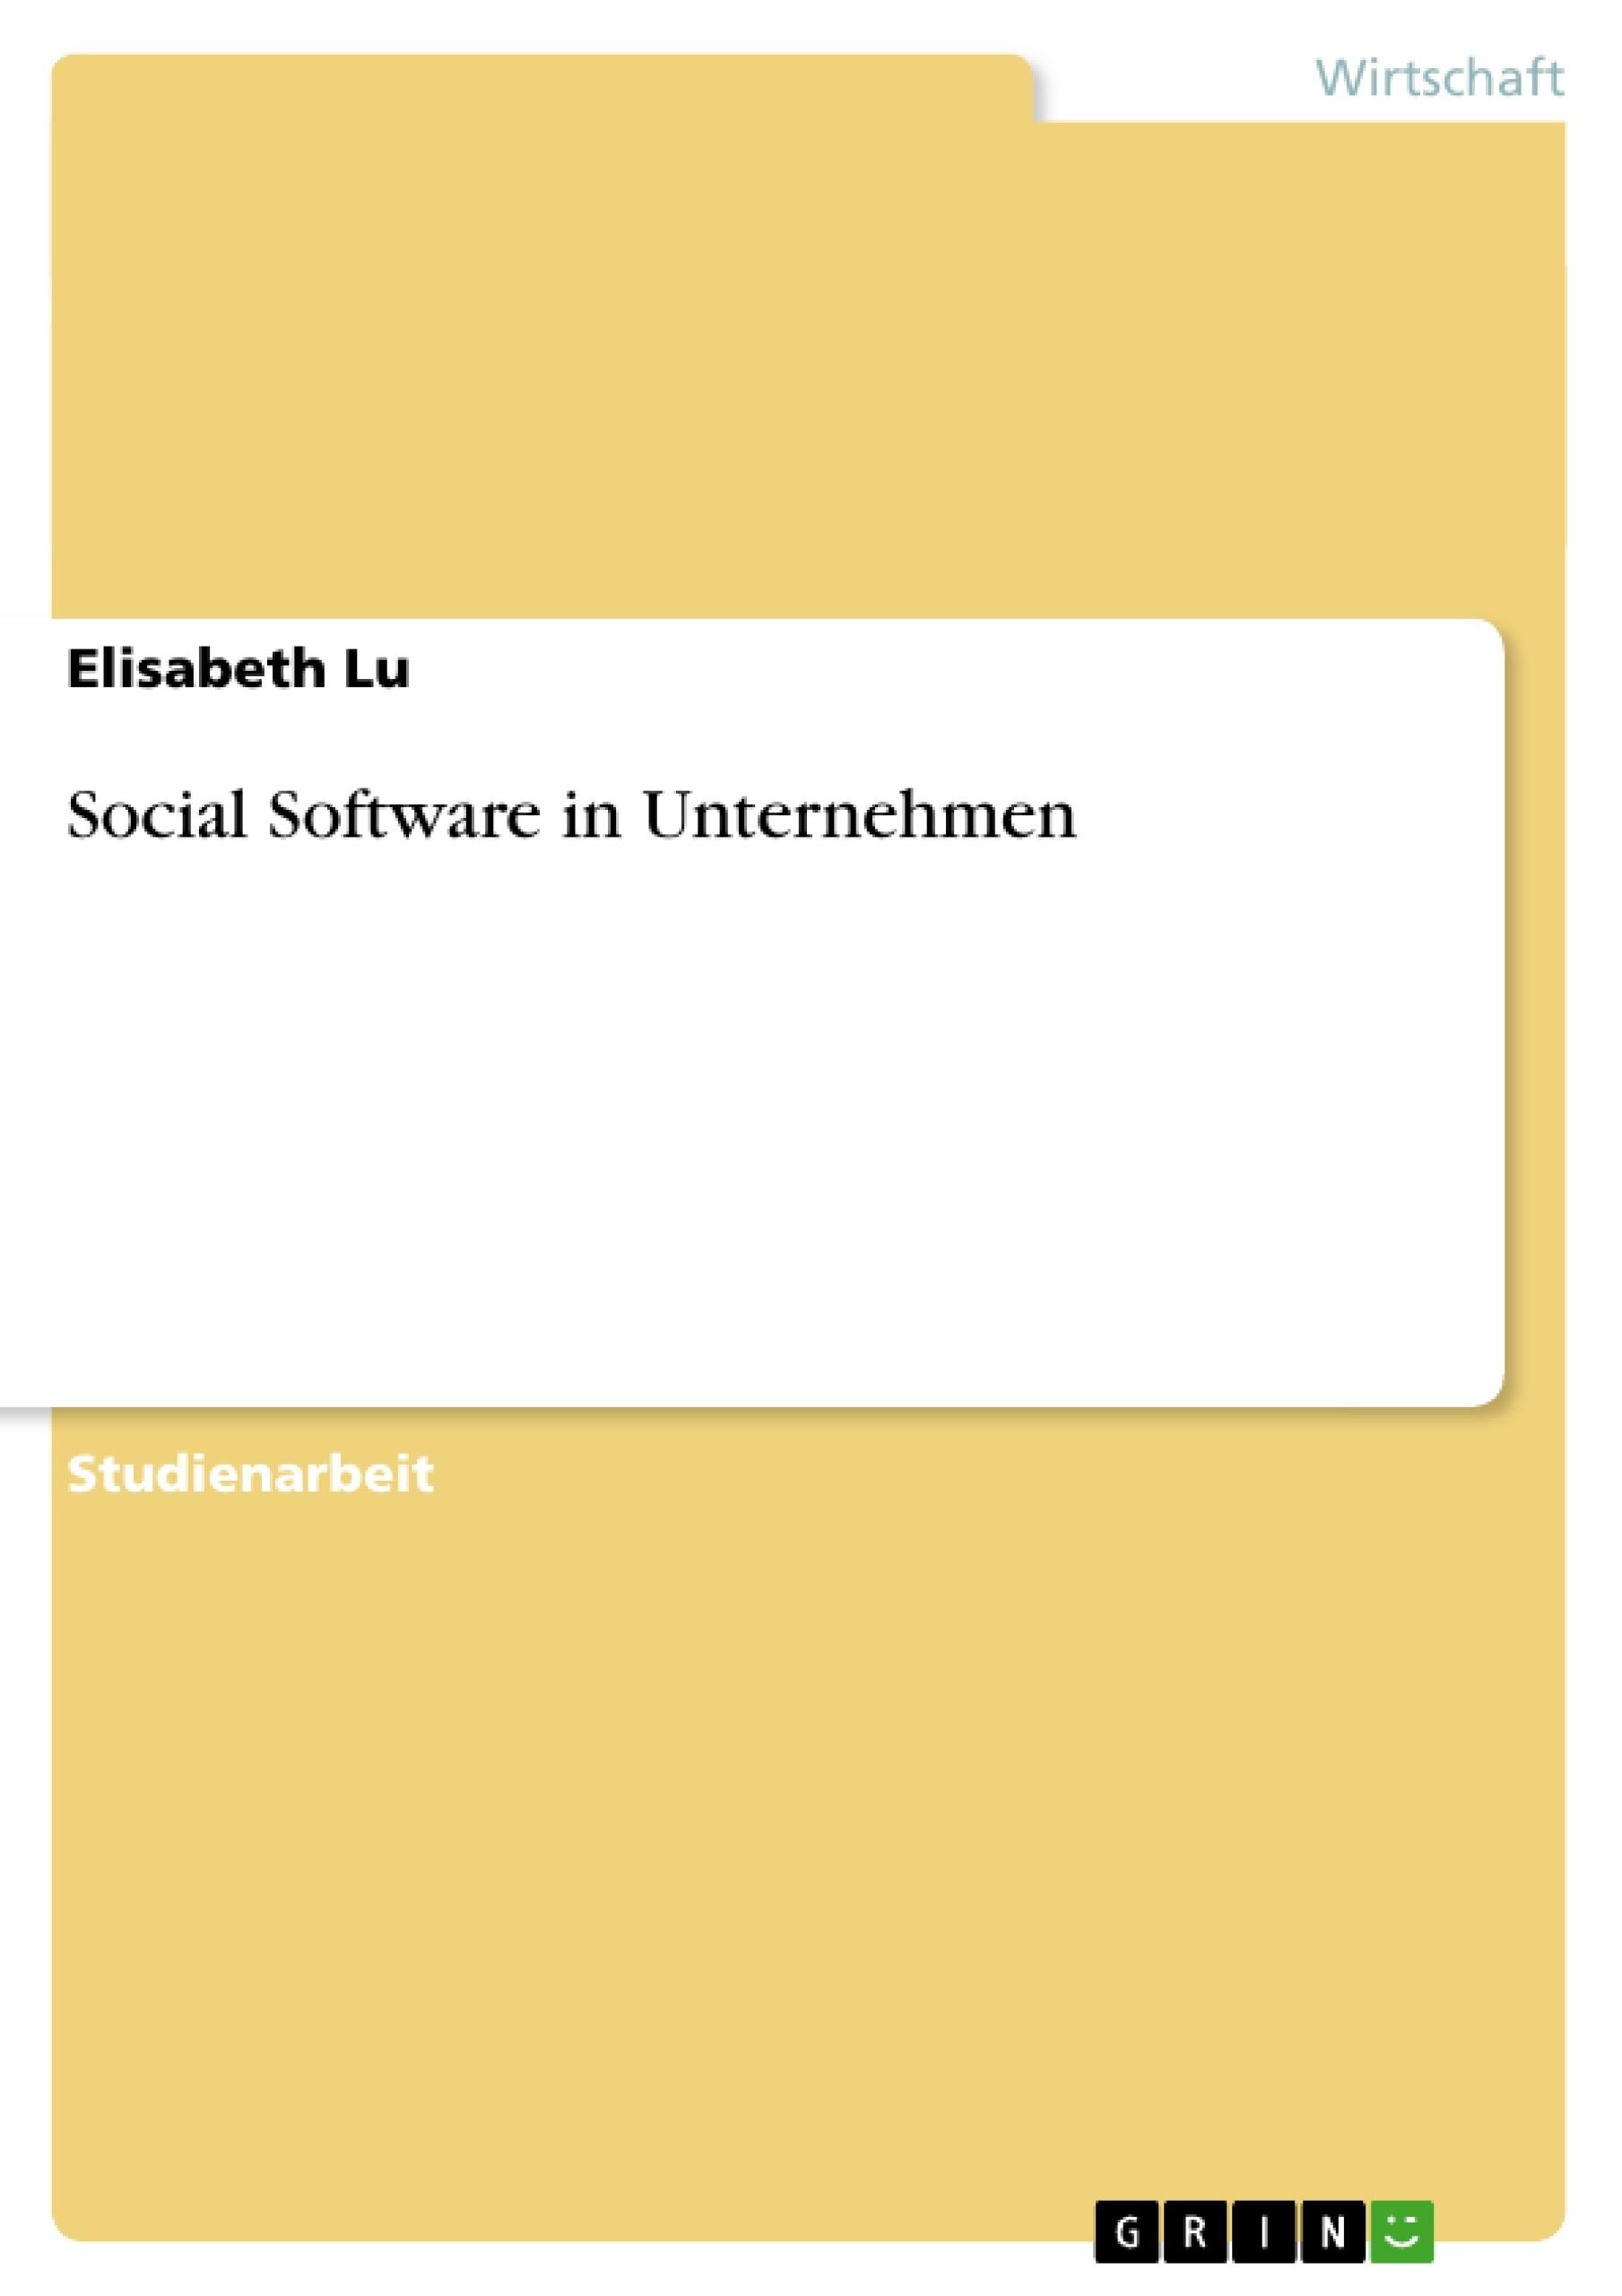 Titel: Social Software in Unternehmen